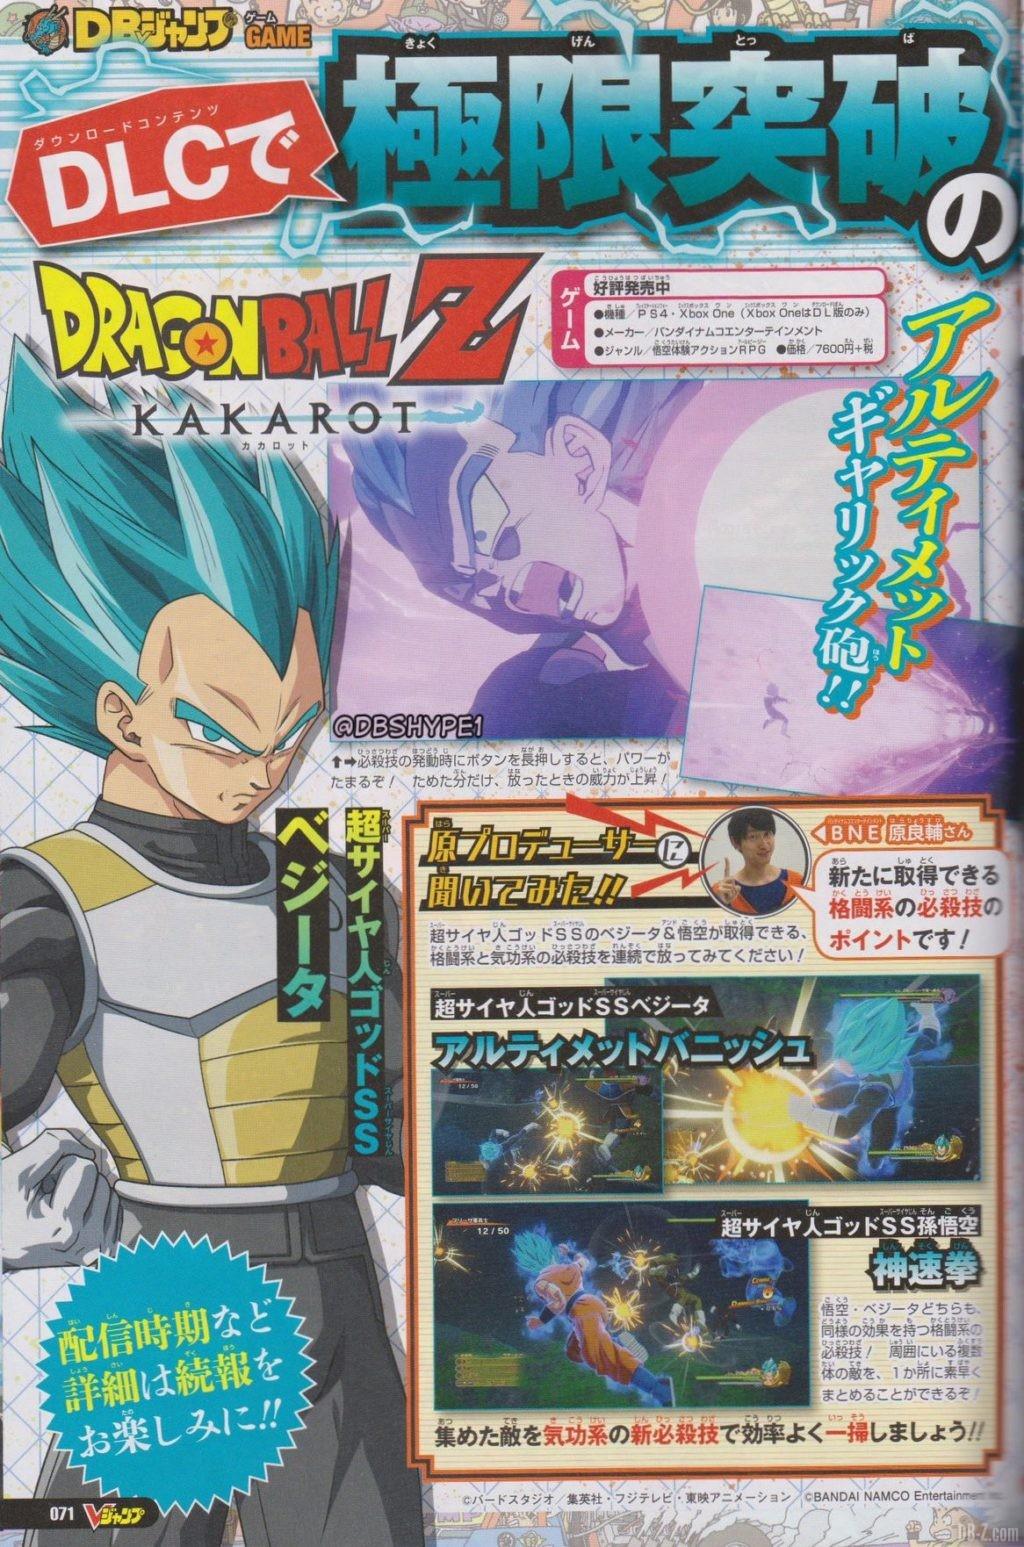 Dragon Ball Z Kakarot Un Nouveau Pouvoir Séveille Partie 2 V Jump 1